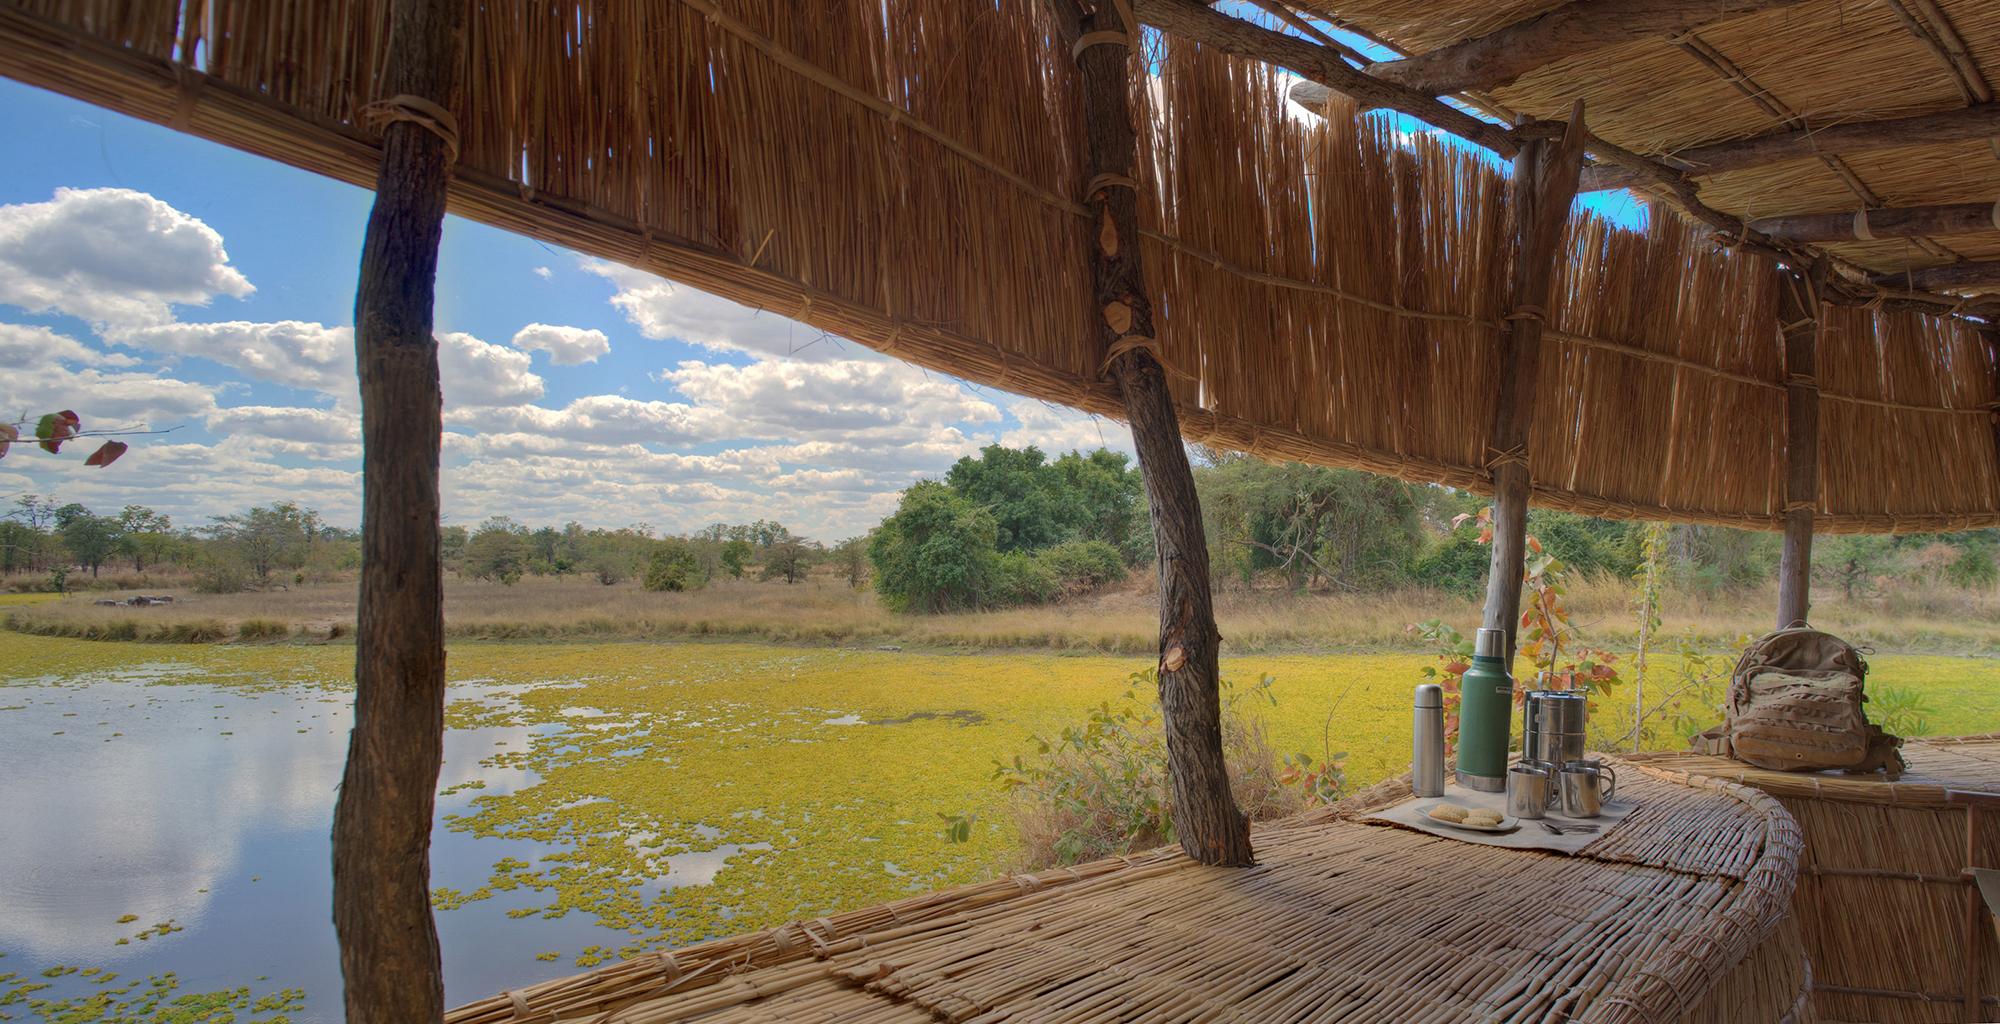 Zambia-Luwi-Camp-View